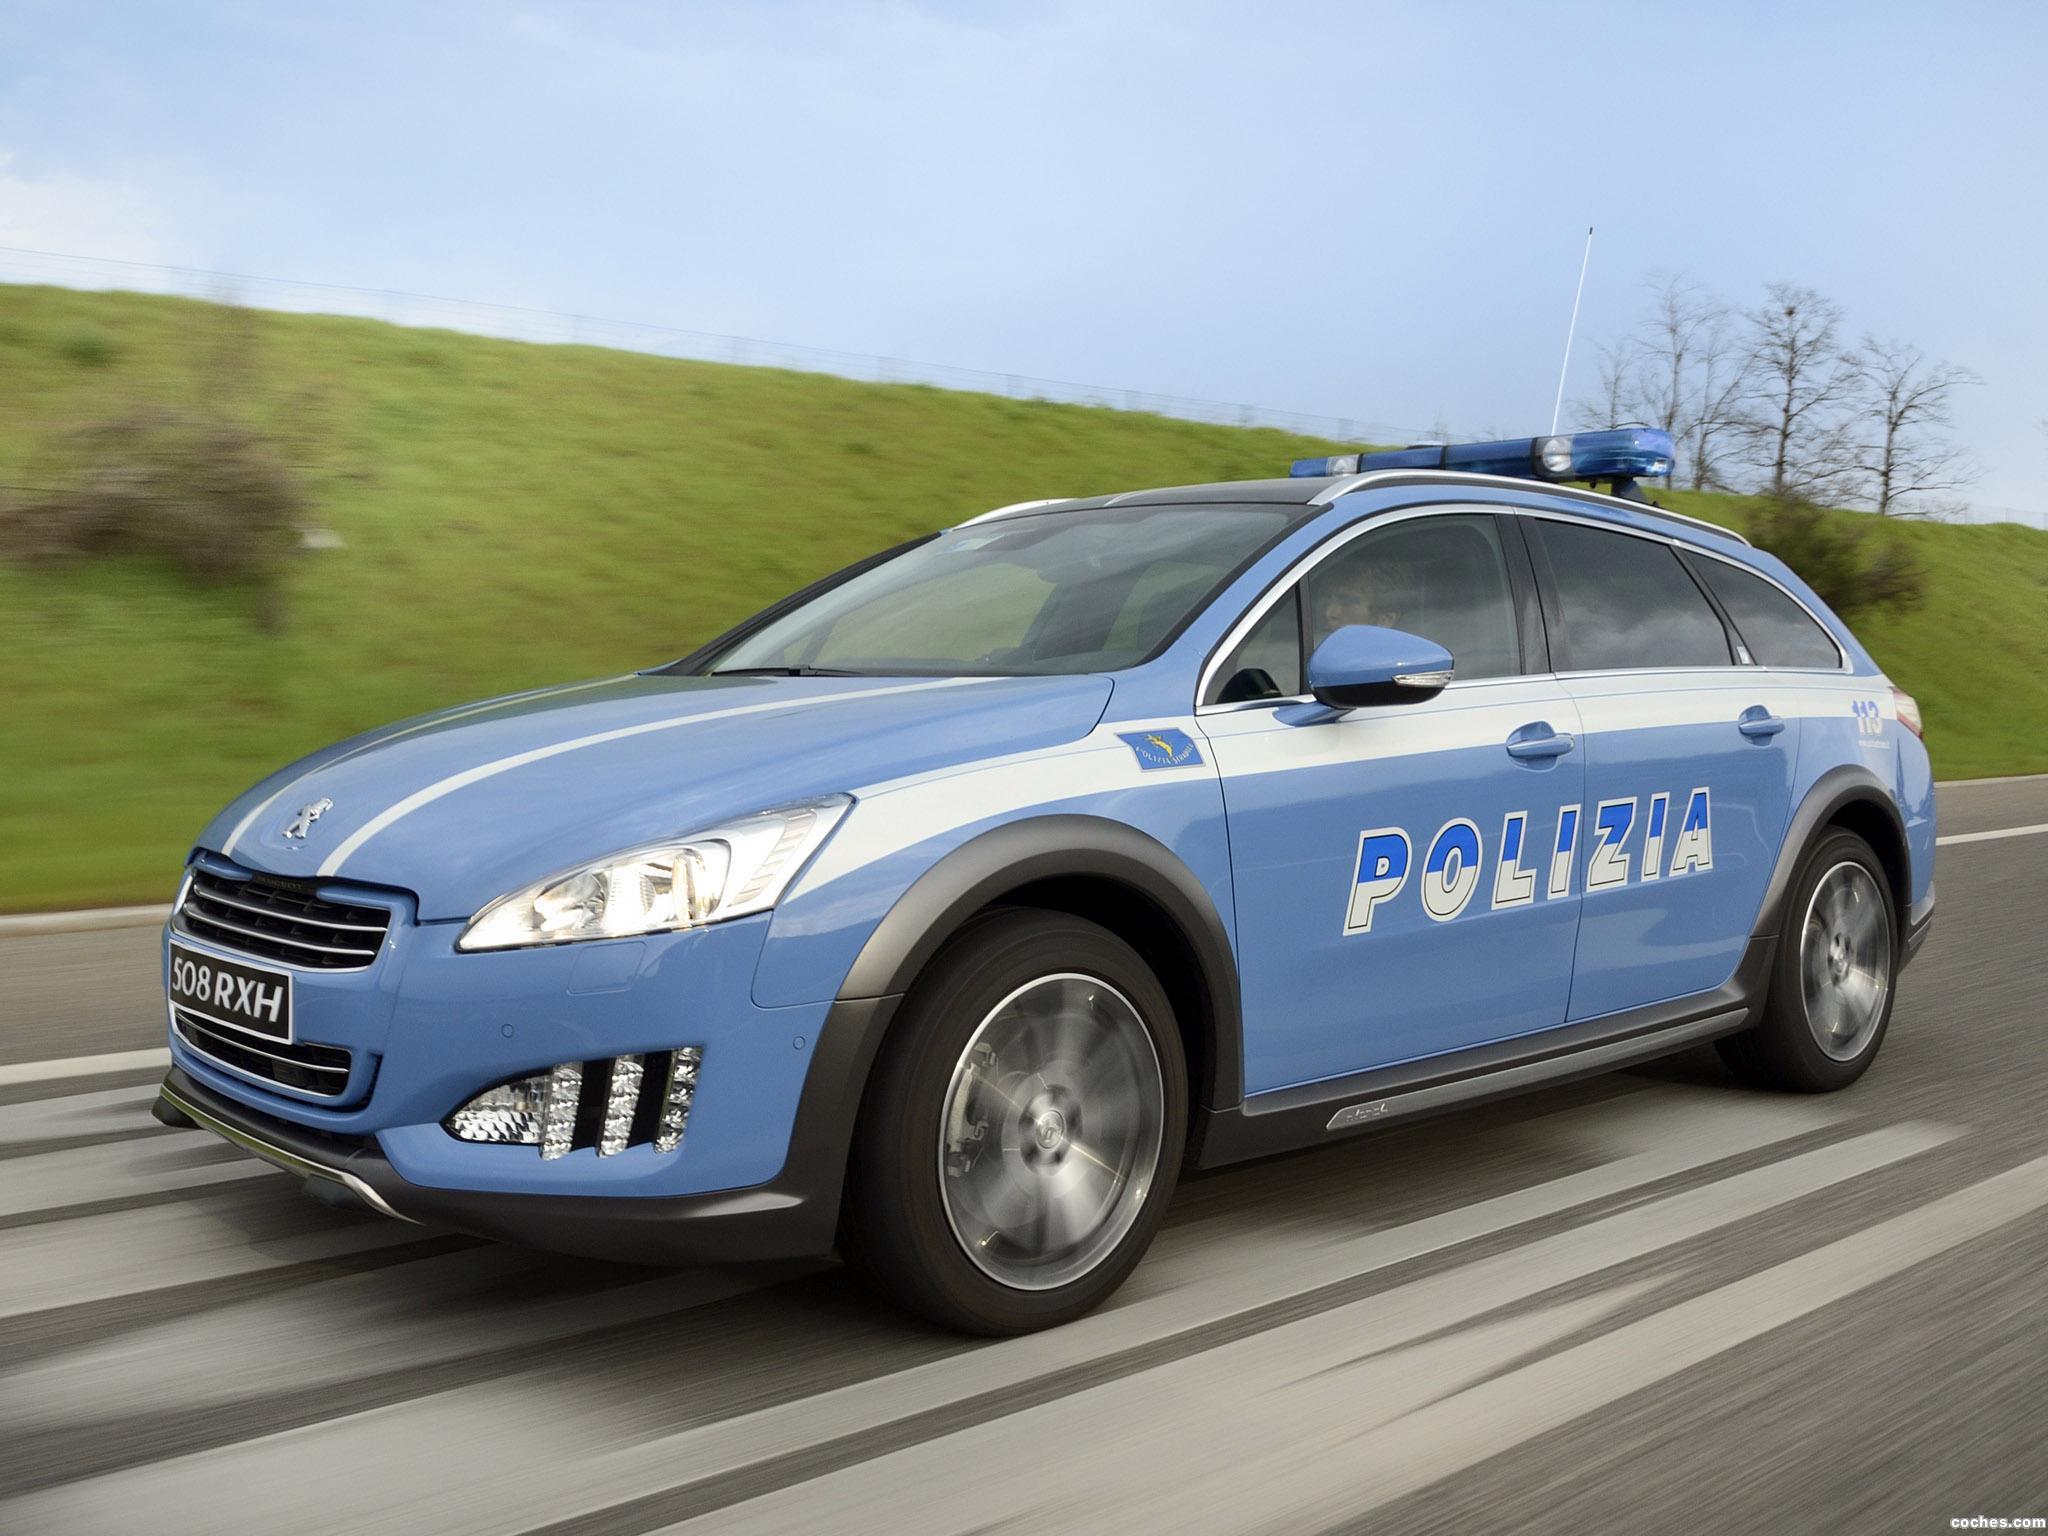 Foto 0 de Peugeot 508 RXH Police Car 2014